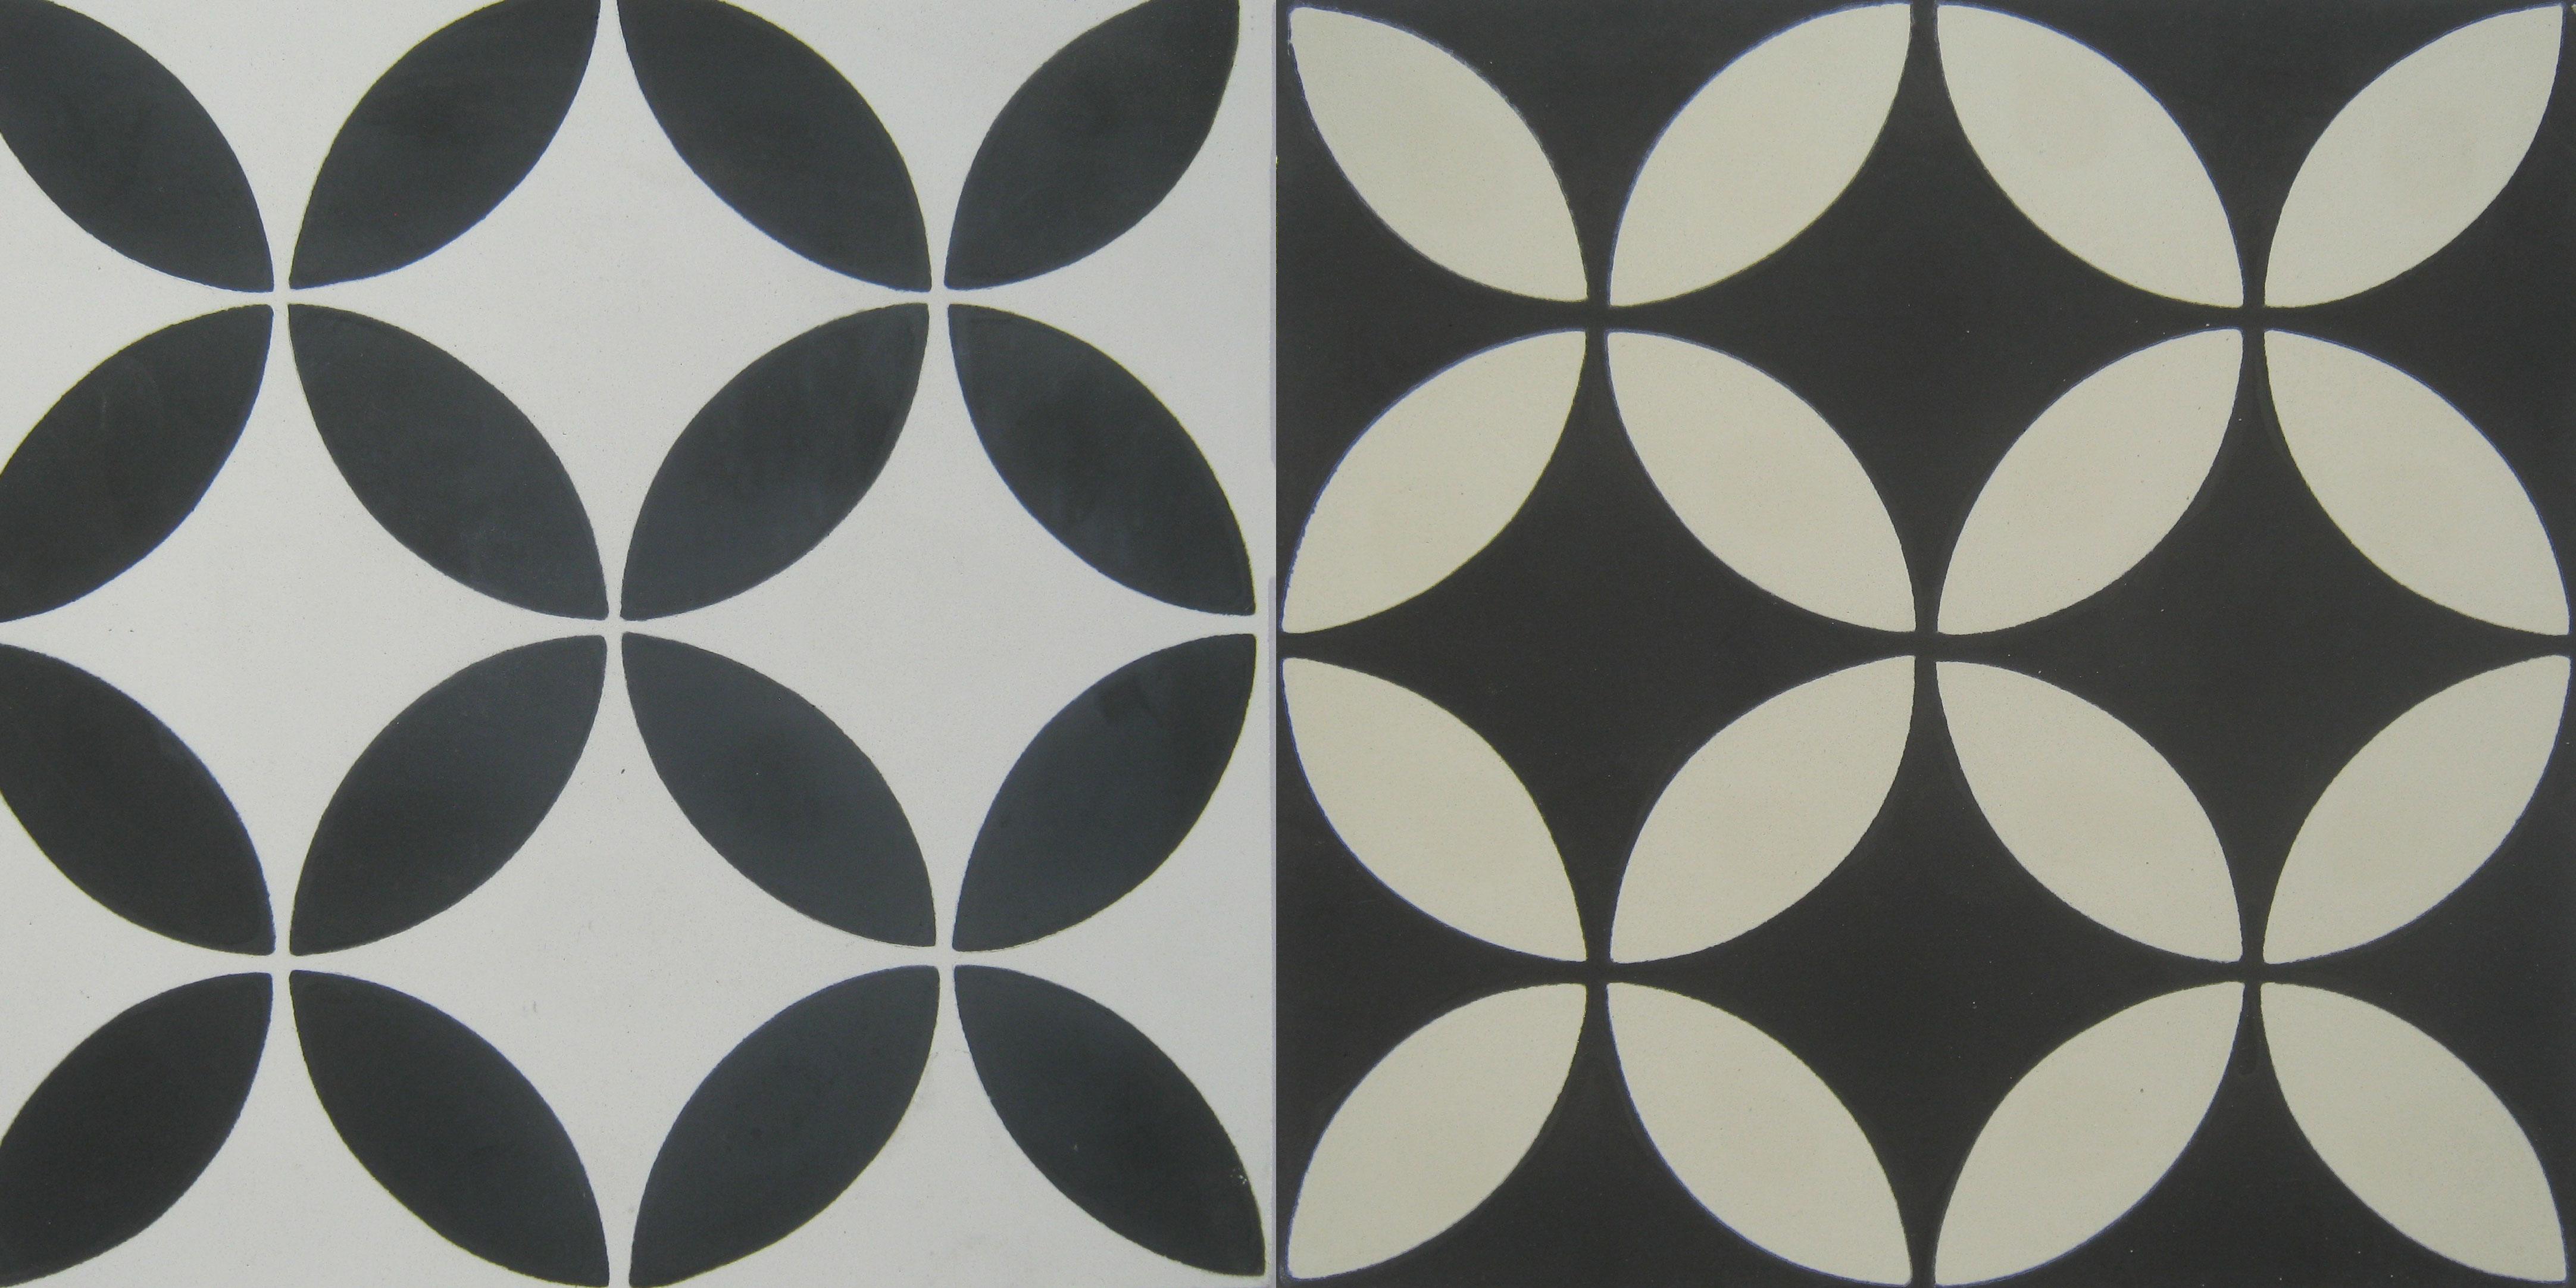 Large Format Cement Tiles In Stock Cement Tile Shop Blog